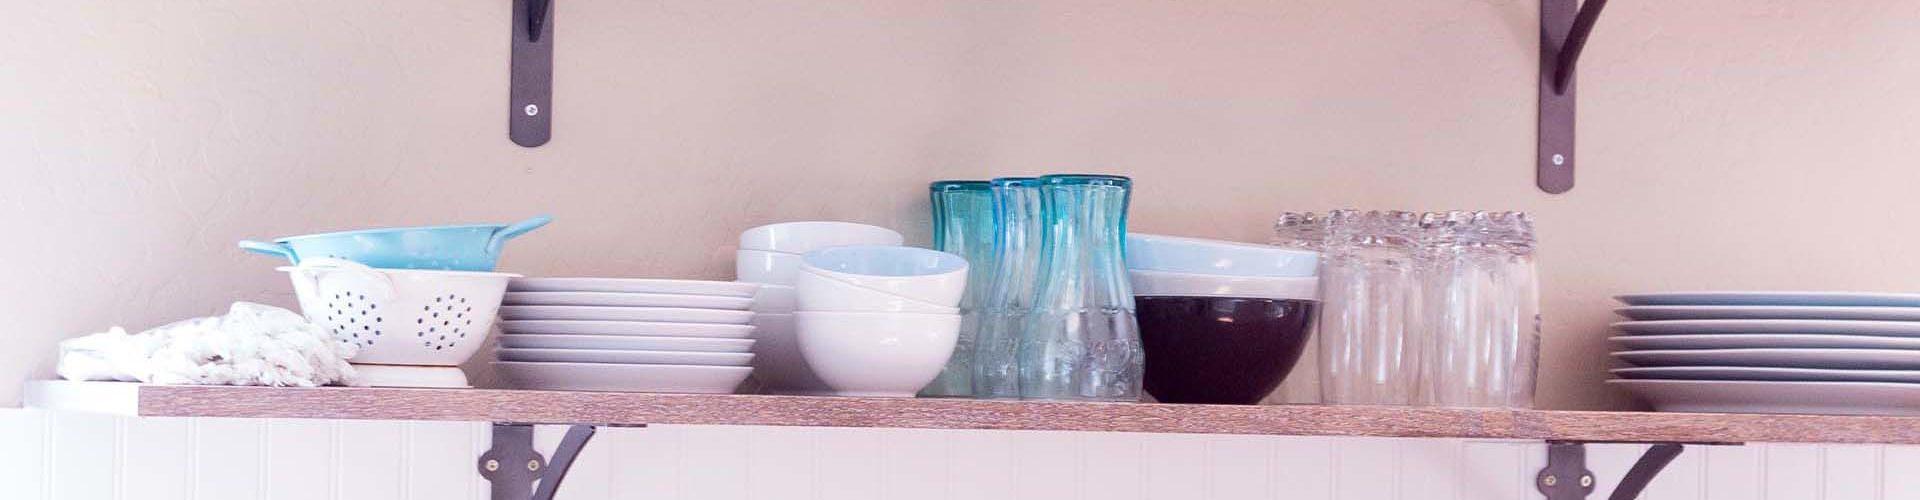 kitchen open shelving dish storage counter